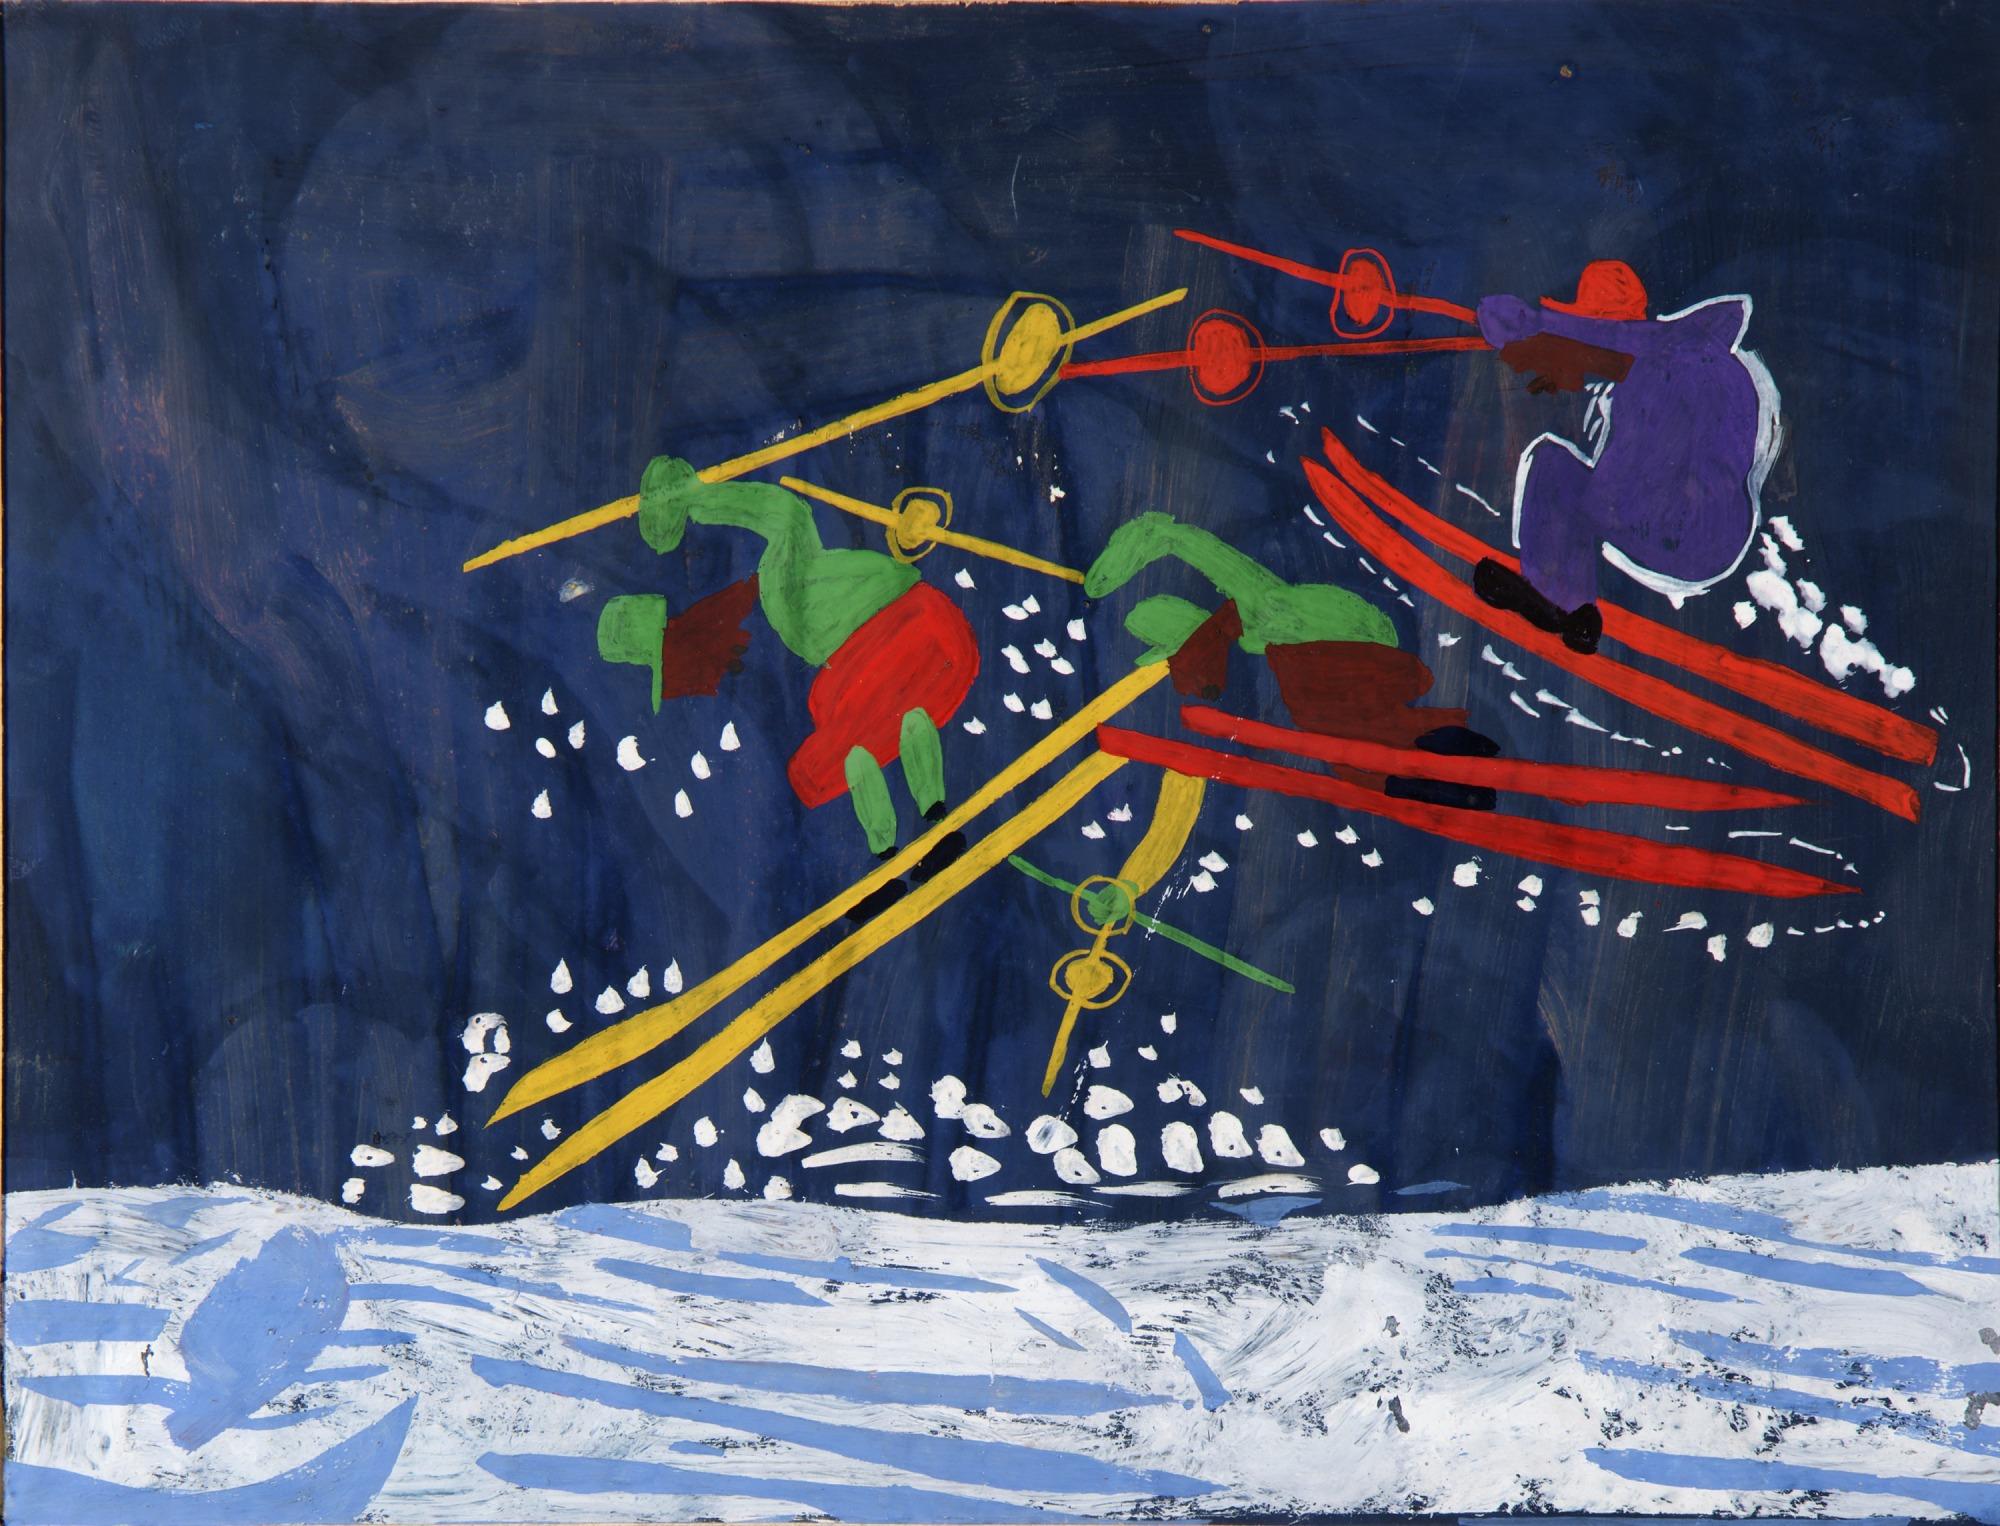 images for Ski Jump